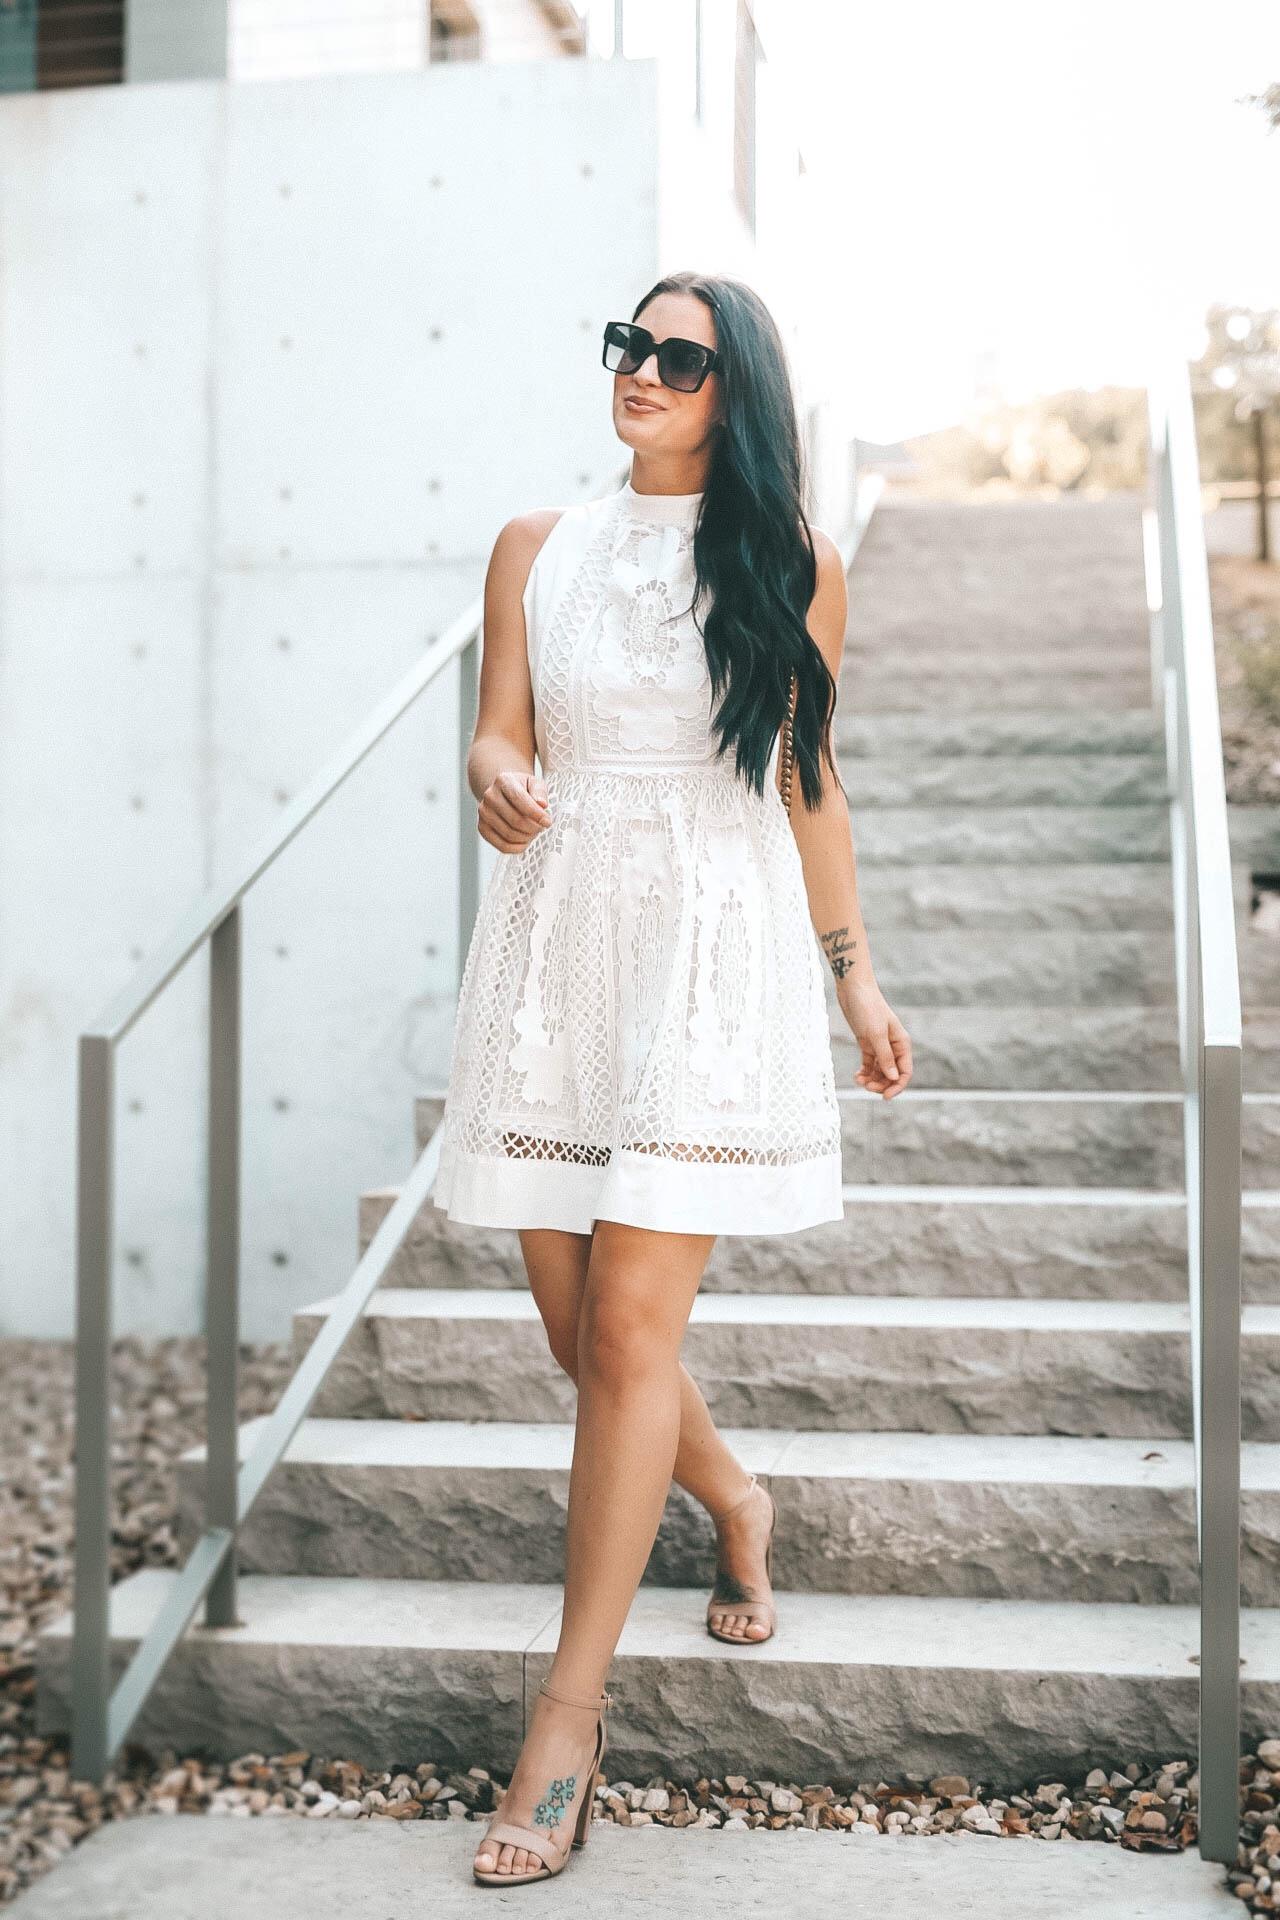 #summertofall #whitedress #lacedress #transitionaloutfit #womensoutfits #fallfashion #dtkaustin | Chicwish | {Transition Your White Lace Dress into Fall} featured by popular Austin fashion blogger Dressed to Kill